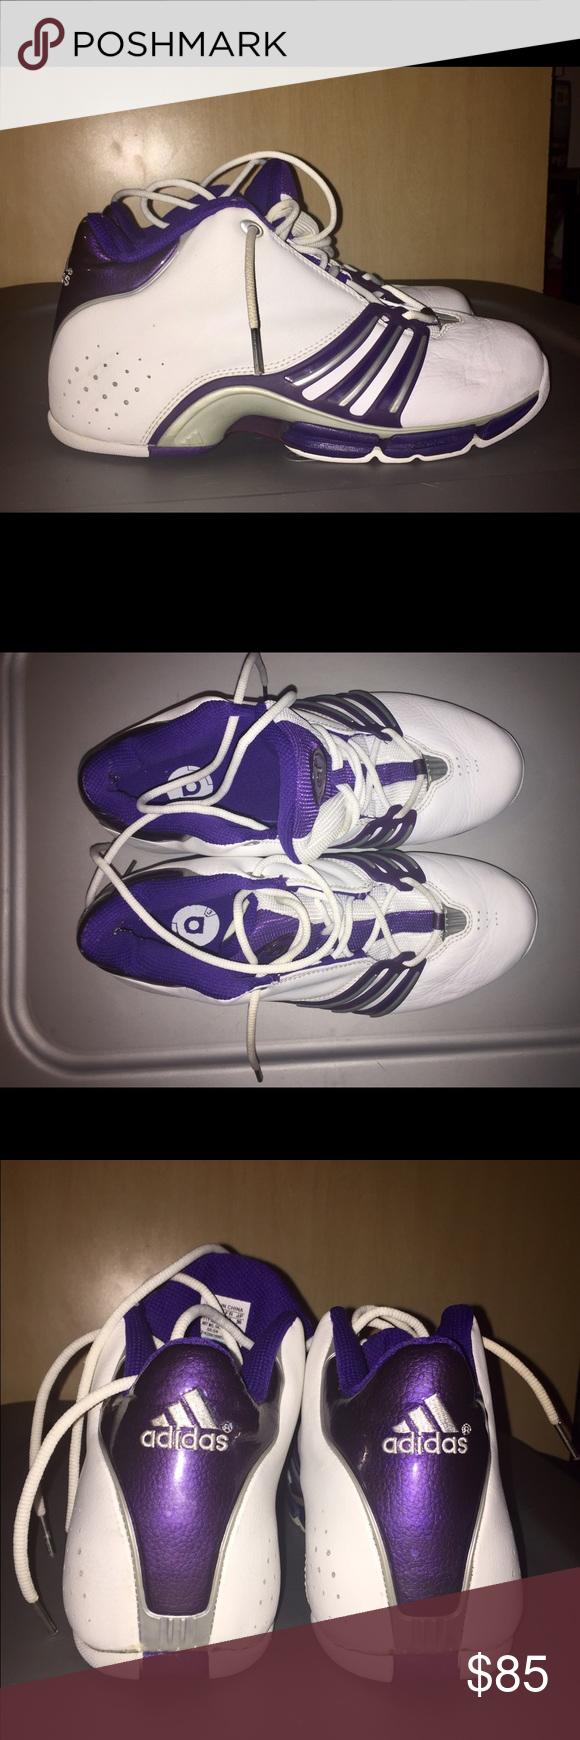 Adidas clu fabbrica 2004 ff esplodere campione pinterest